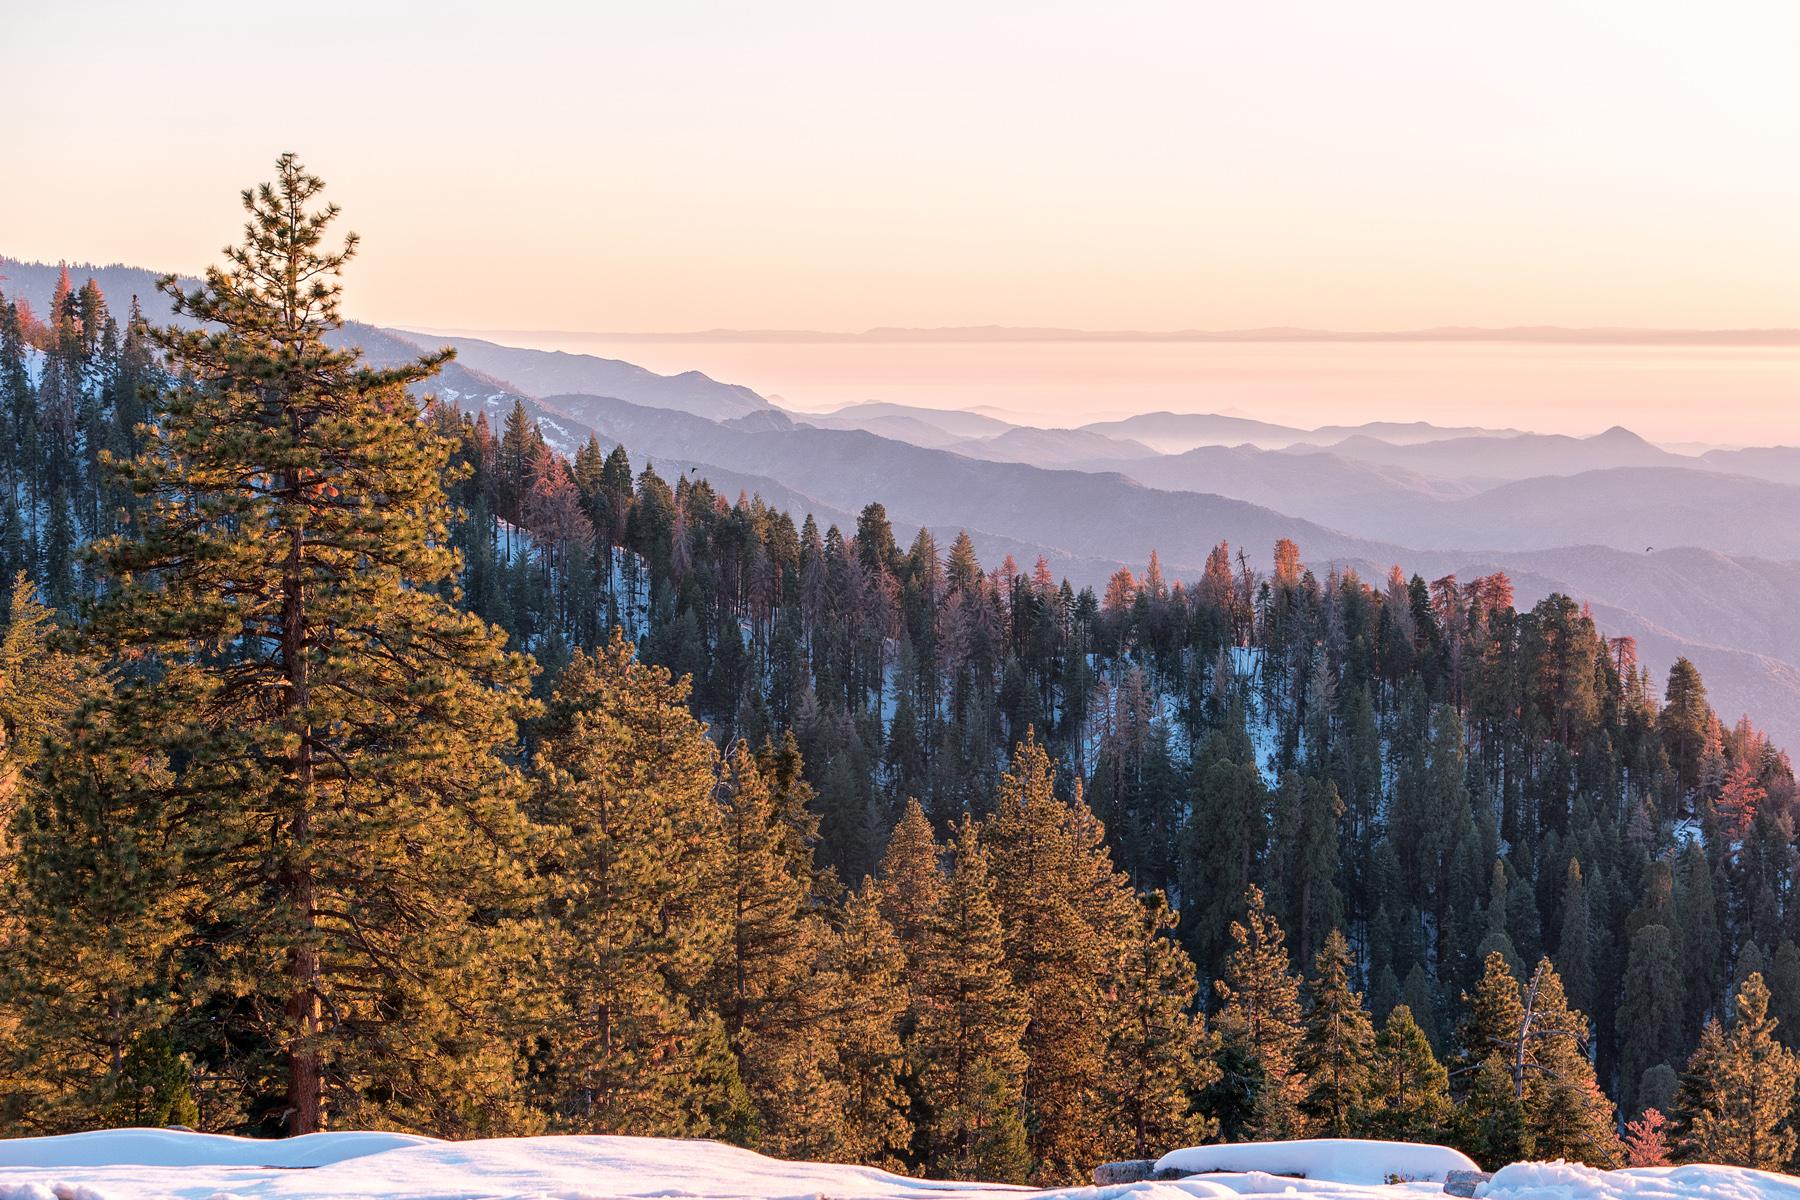 Wasim Muklashy Photography_Sequoia National Park_California_December 2015_-SAM_4164-Edit_crop1.jpg